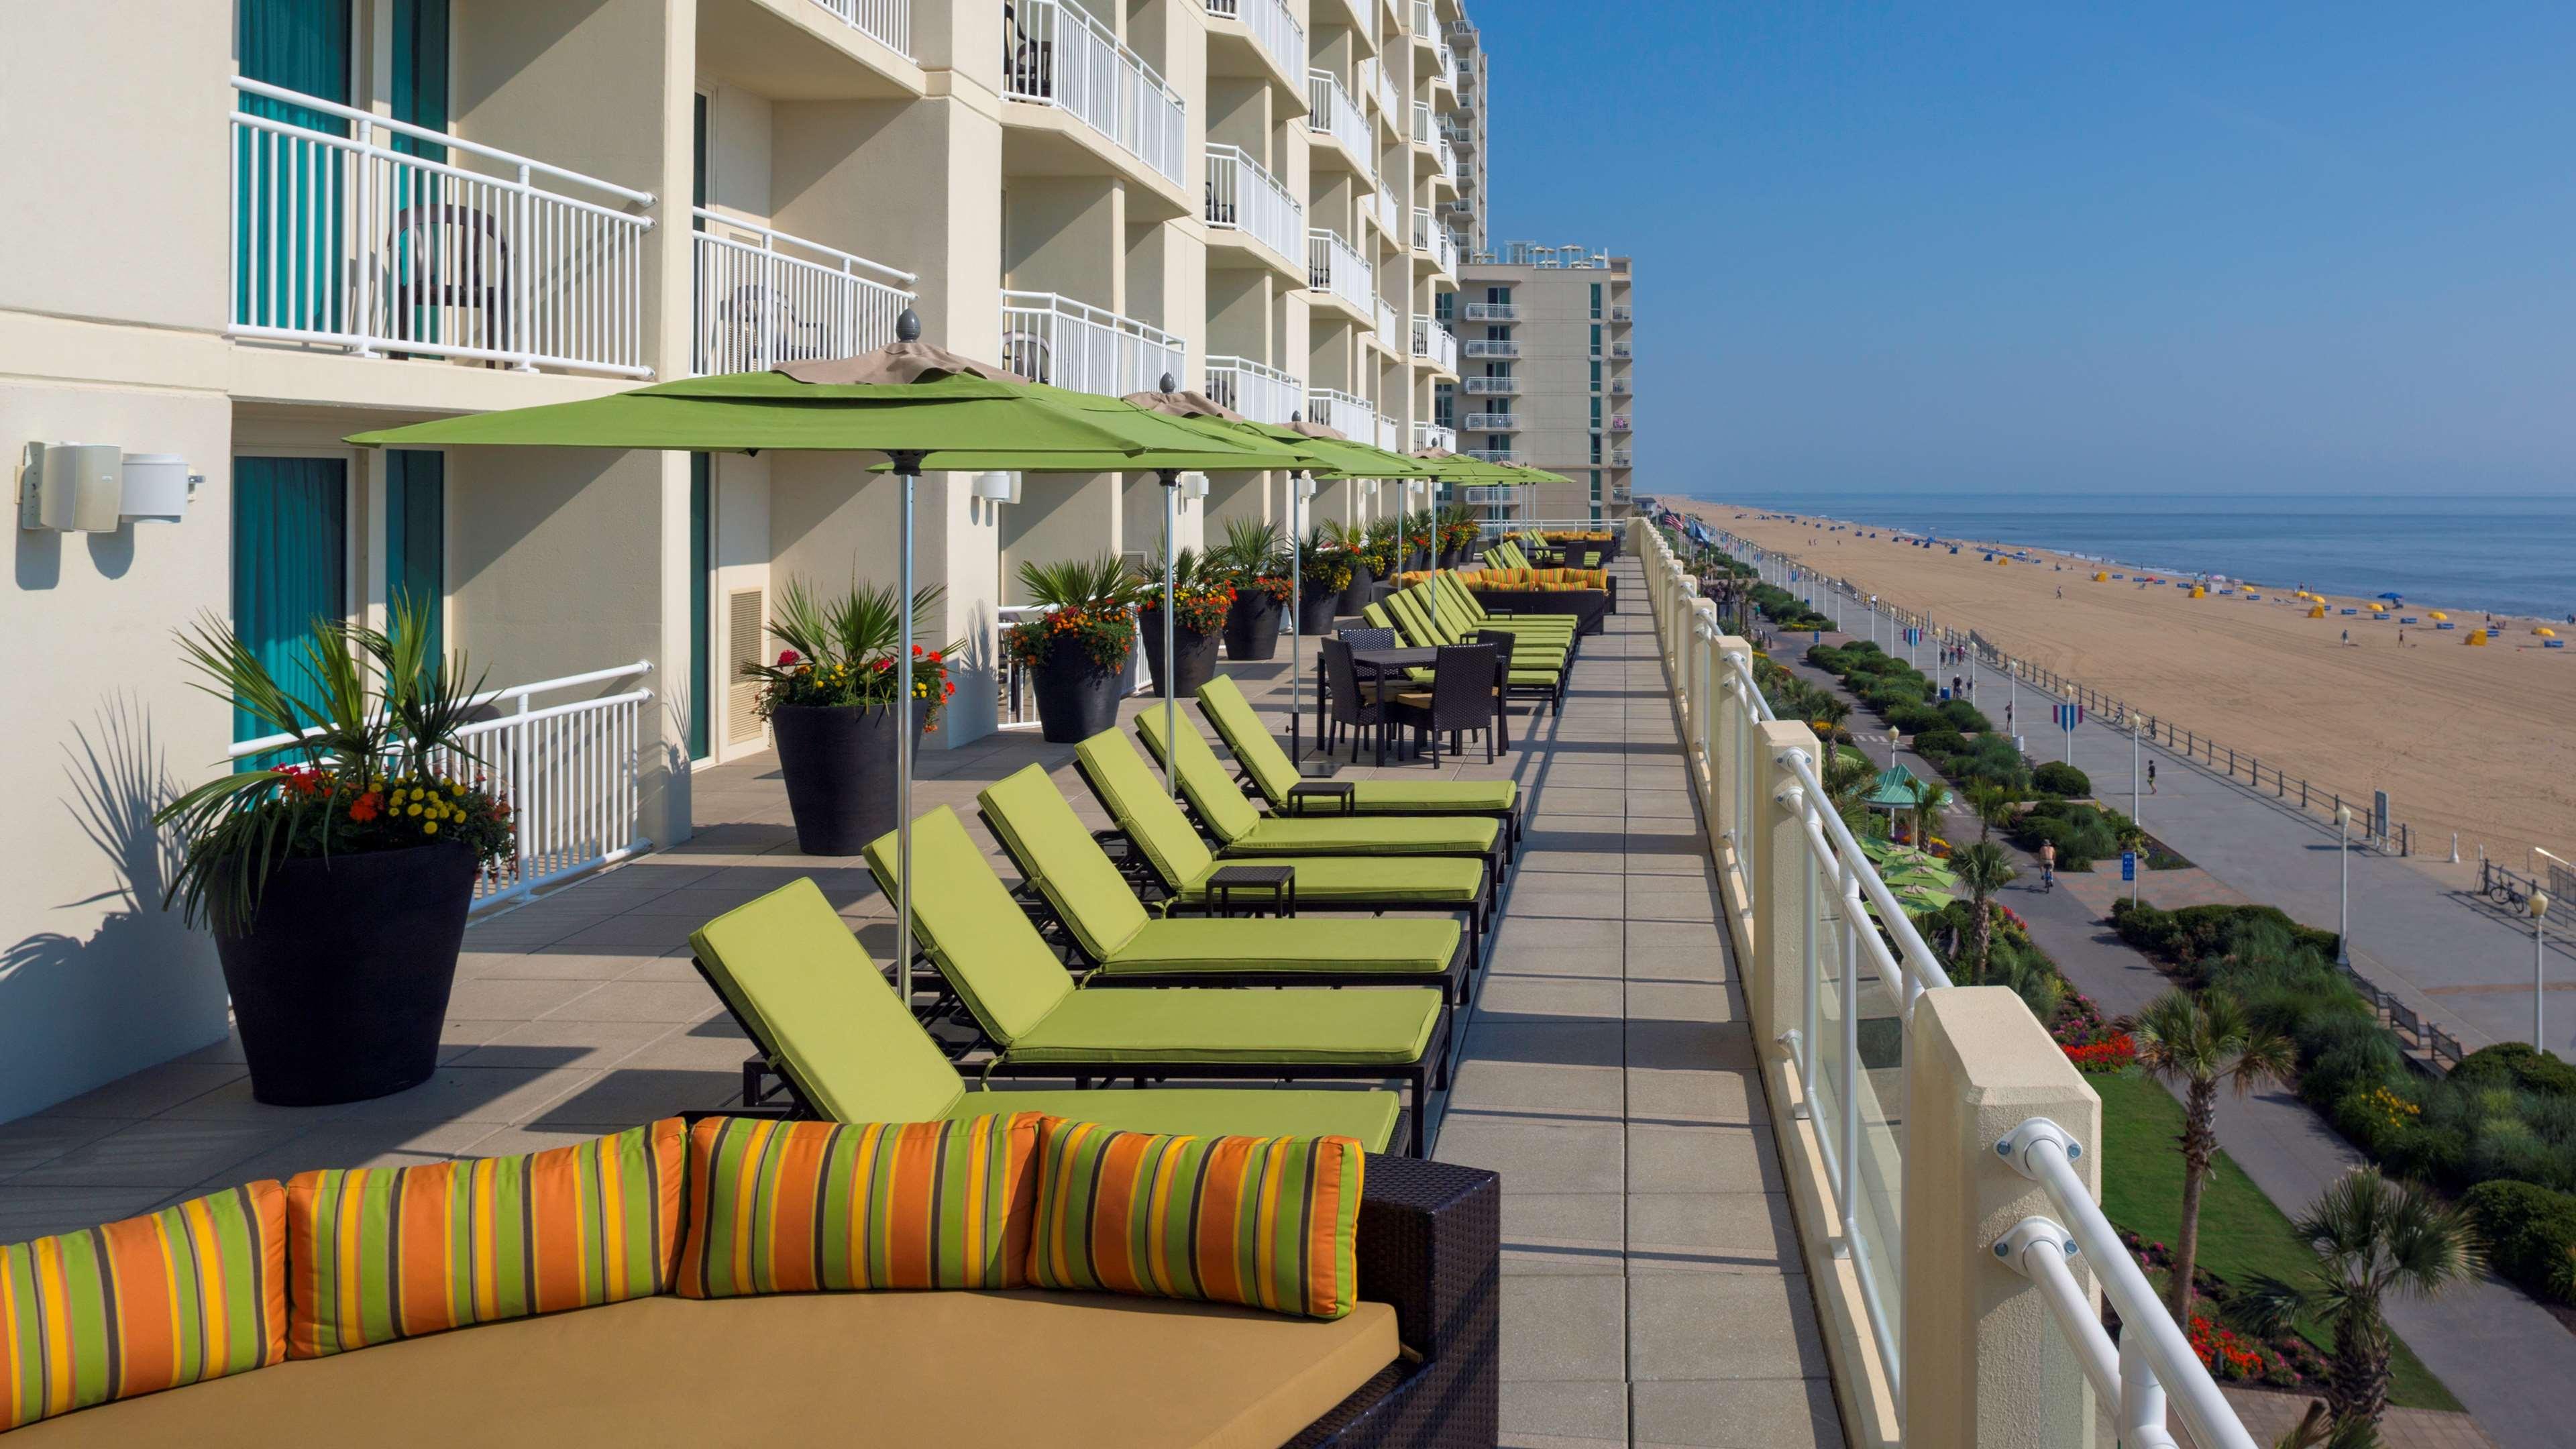 Hilton Garden Inn Virginia Beach Oceanfront image 20